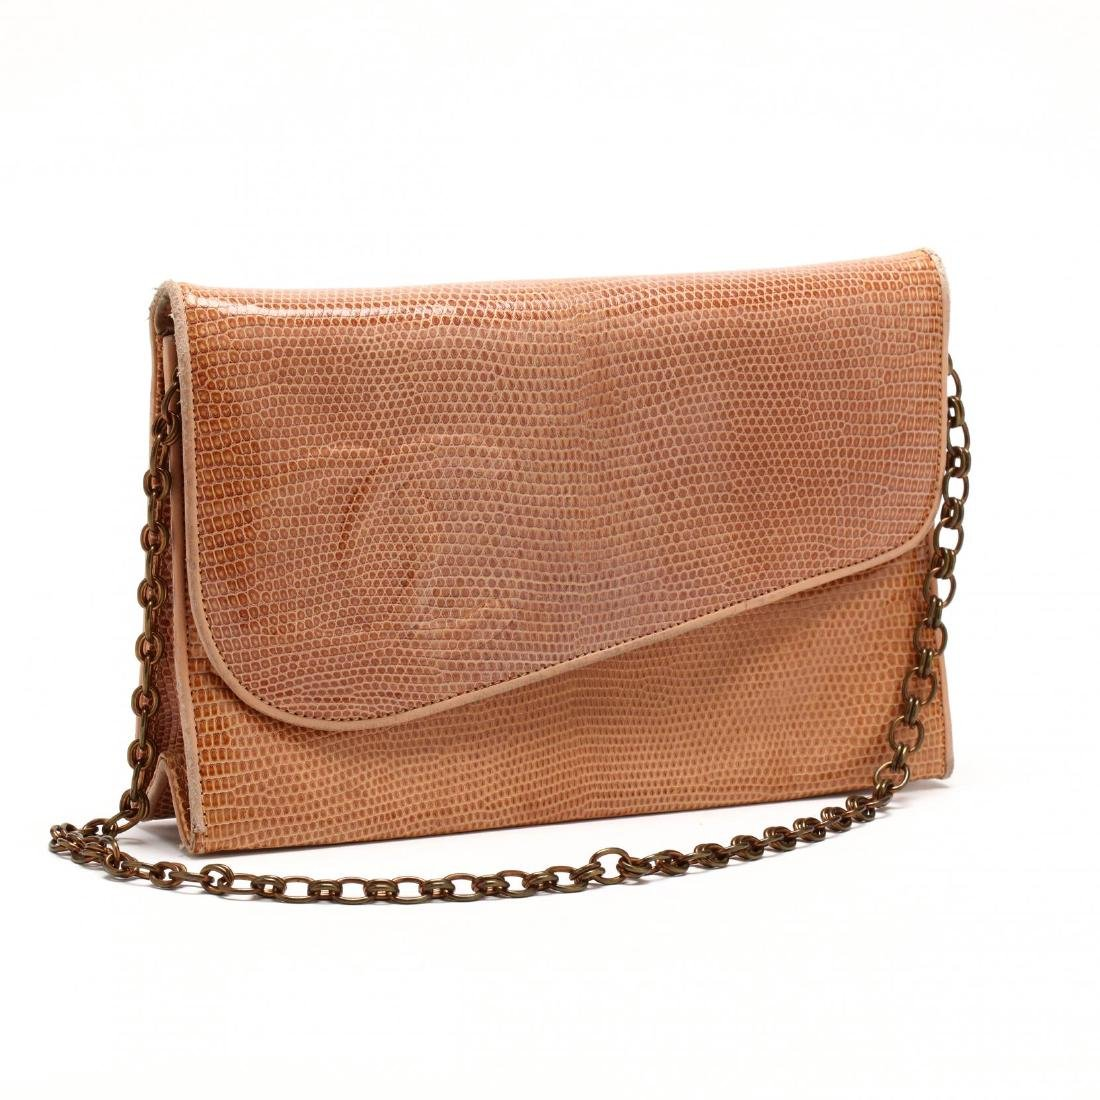 Vintage Lizard Skin Diagonal Front Flap Bag, Chanel